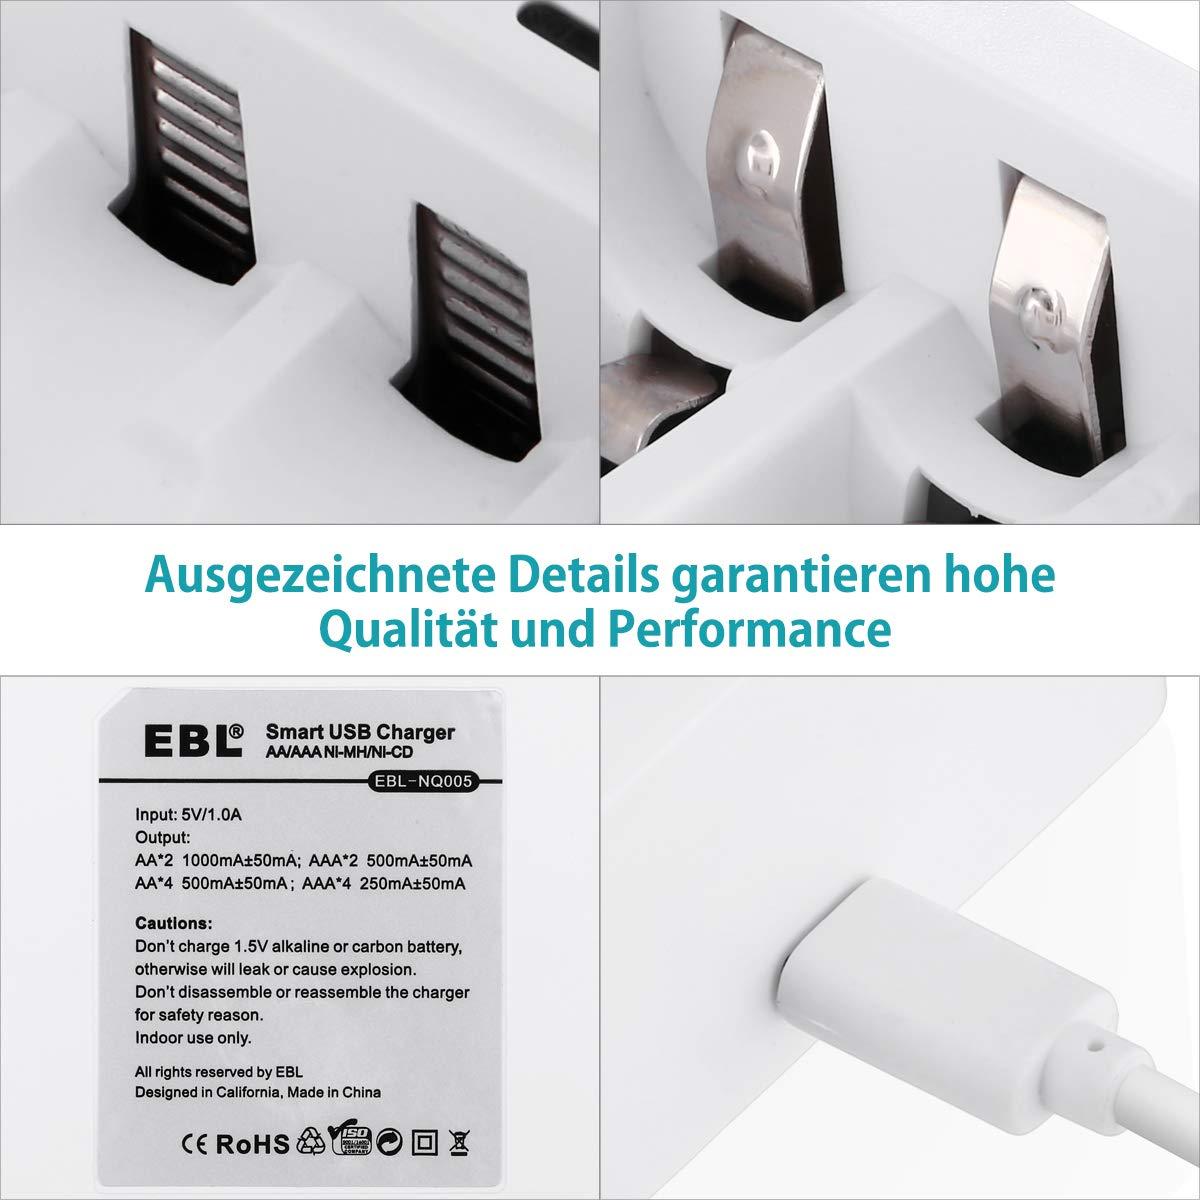 EBL AA AAA Intelligente Akku Ladegerät (4x Stecker) Batterieladegerät für Ni-MH Ni-CD Wiederaufladbare Akku Batterien mit LED-Anzeige